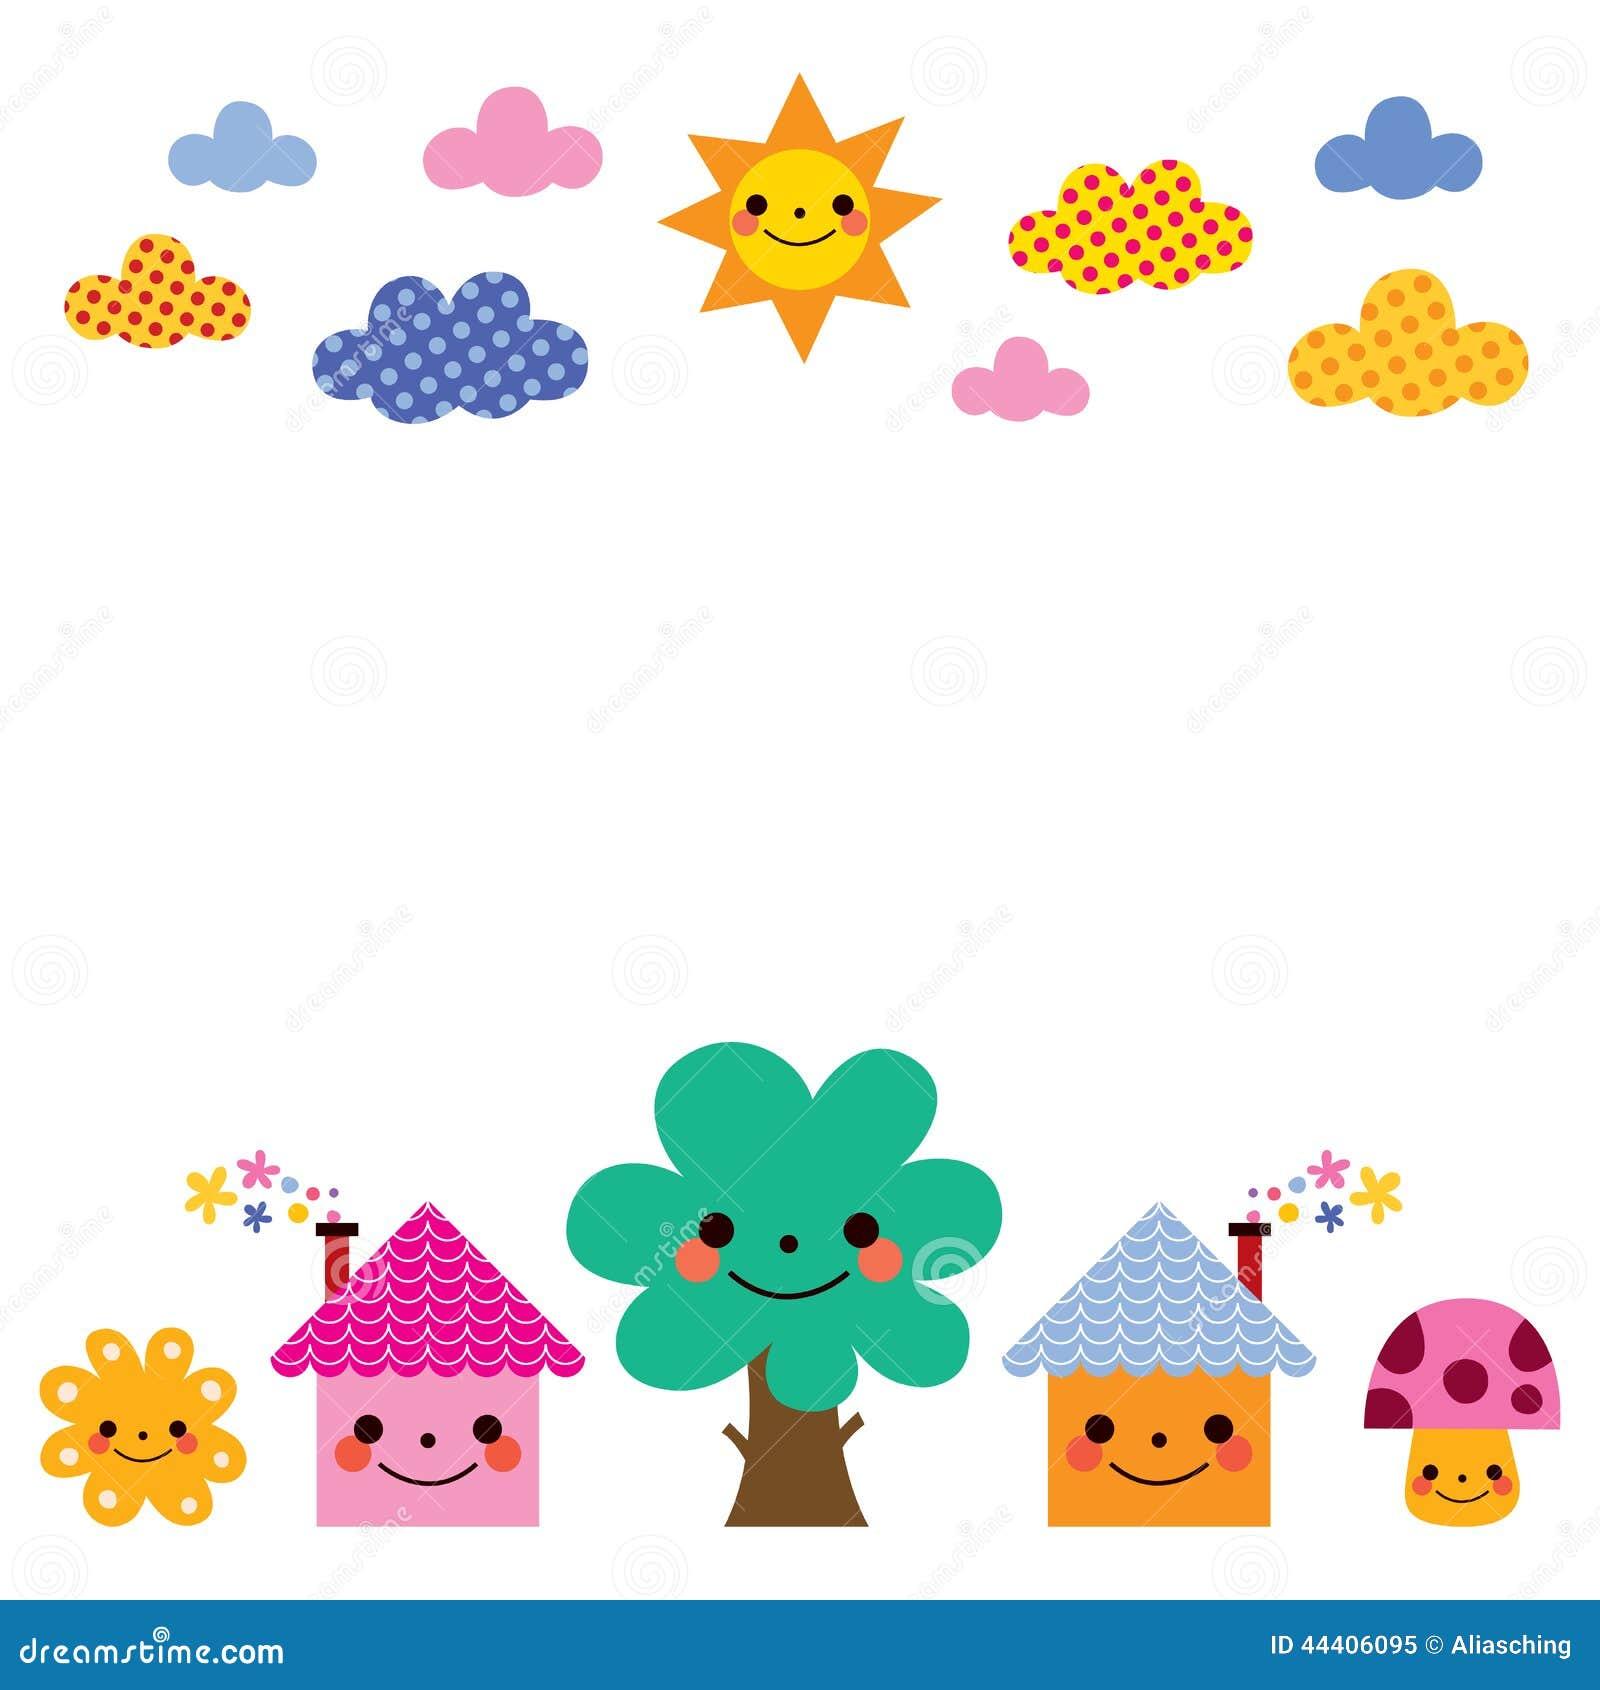 Cute Houses Tree Sun Mushroom Clouds Kids Background